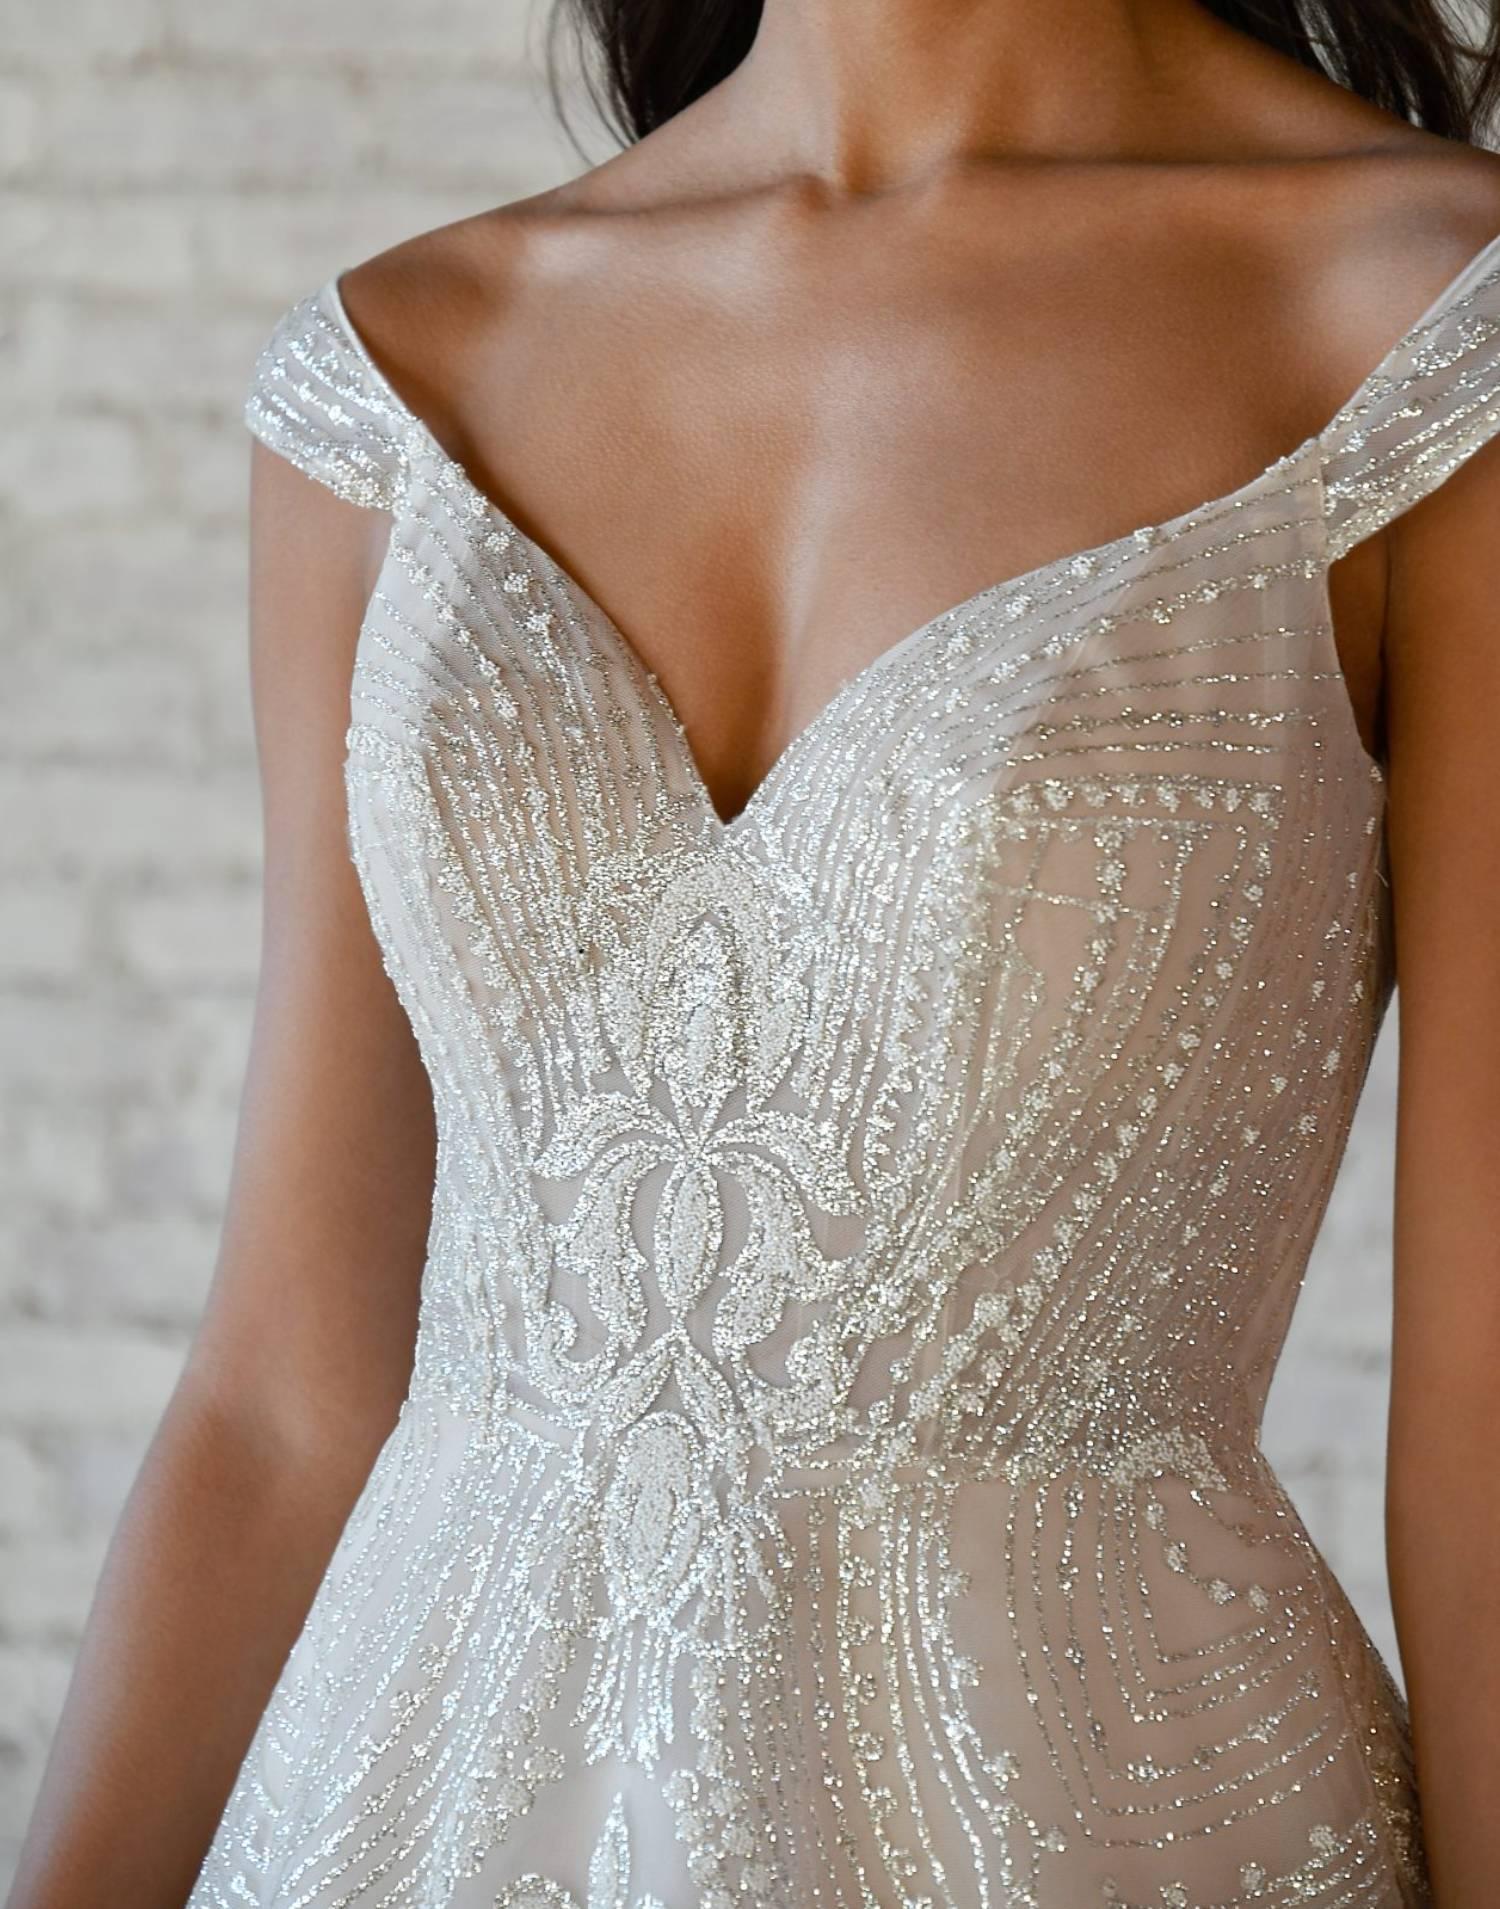 7336-wedding-dress-Stella-York-front-view-min